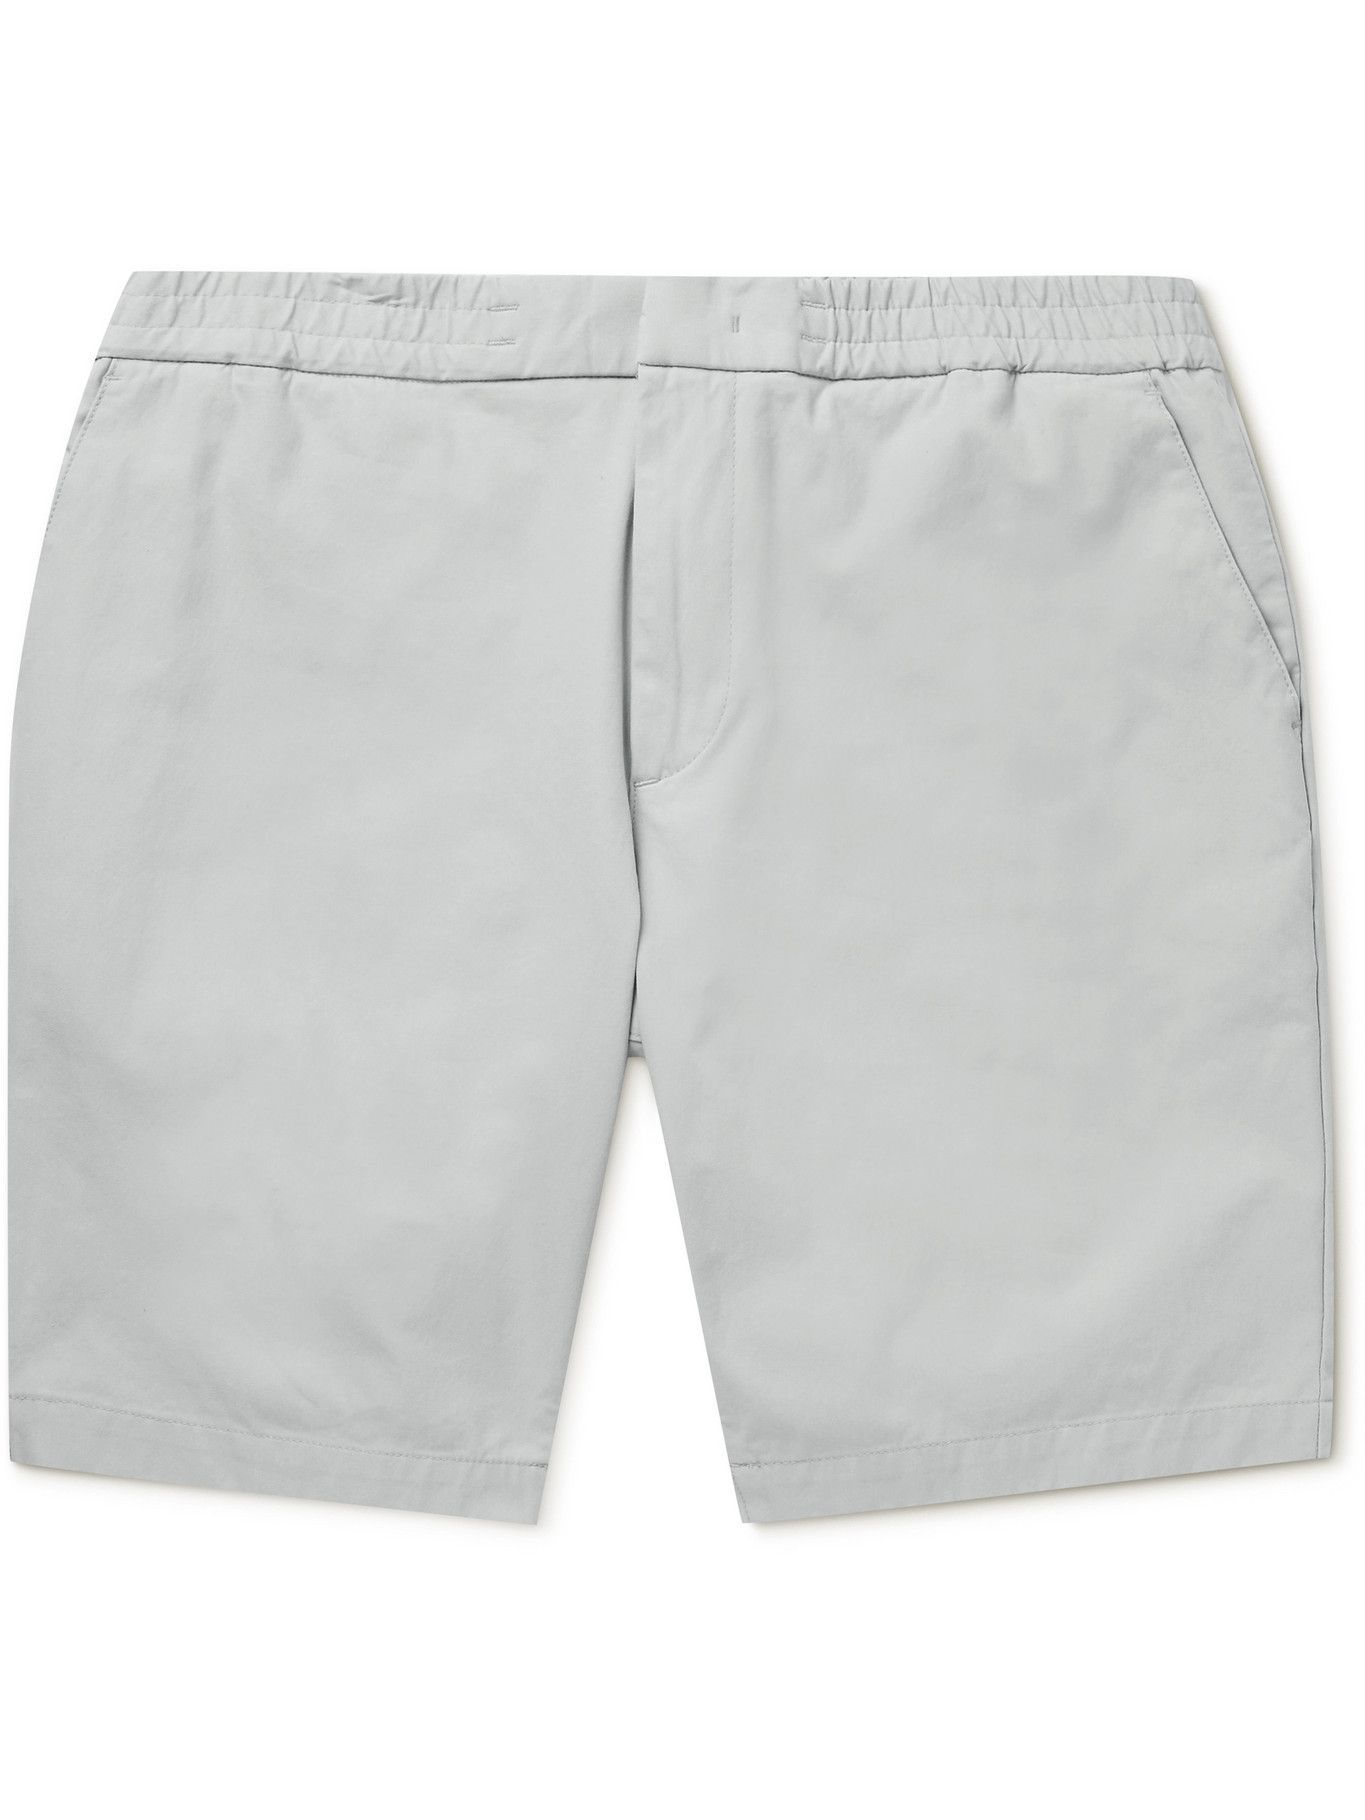 HUGO BOSS - Cotton-Blend Shorts - Gray